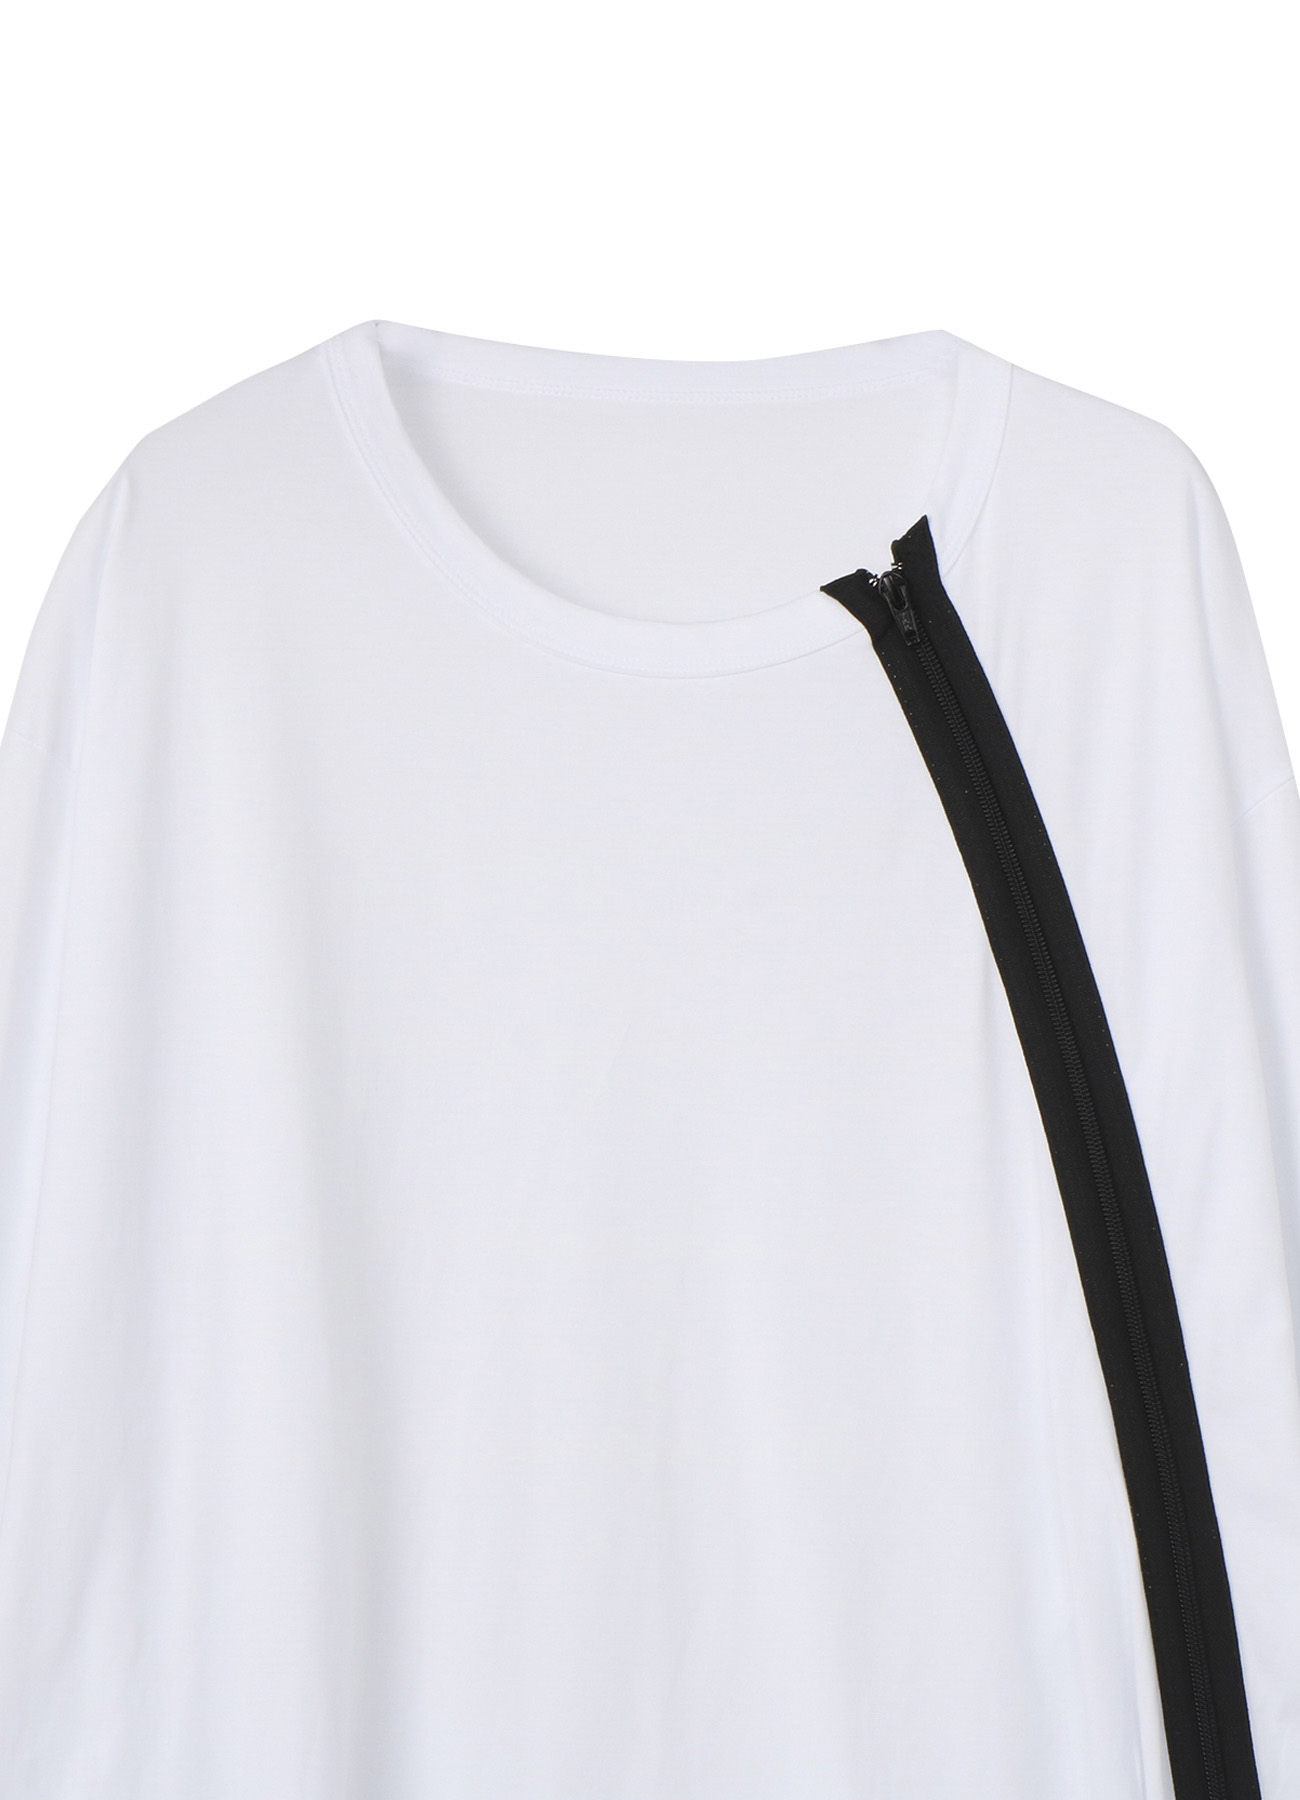 30/cotton Jersey Shoulders Zipper Short Sleeve T